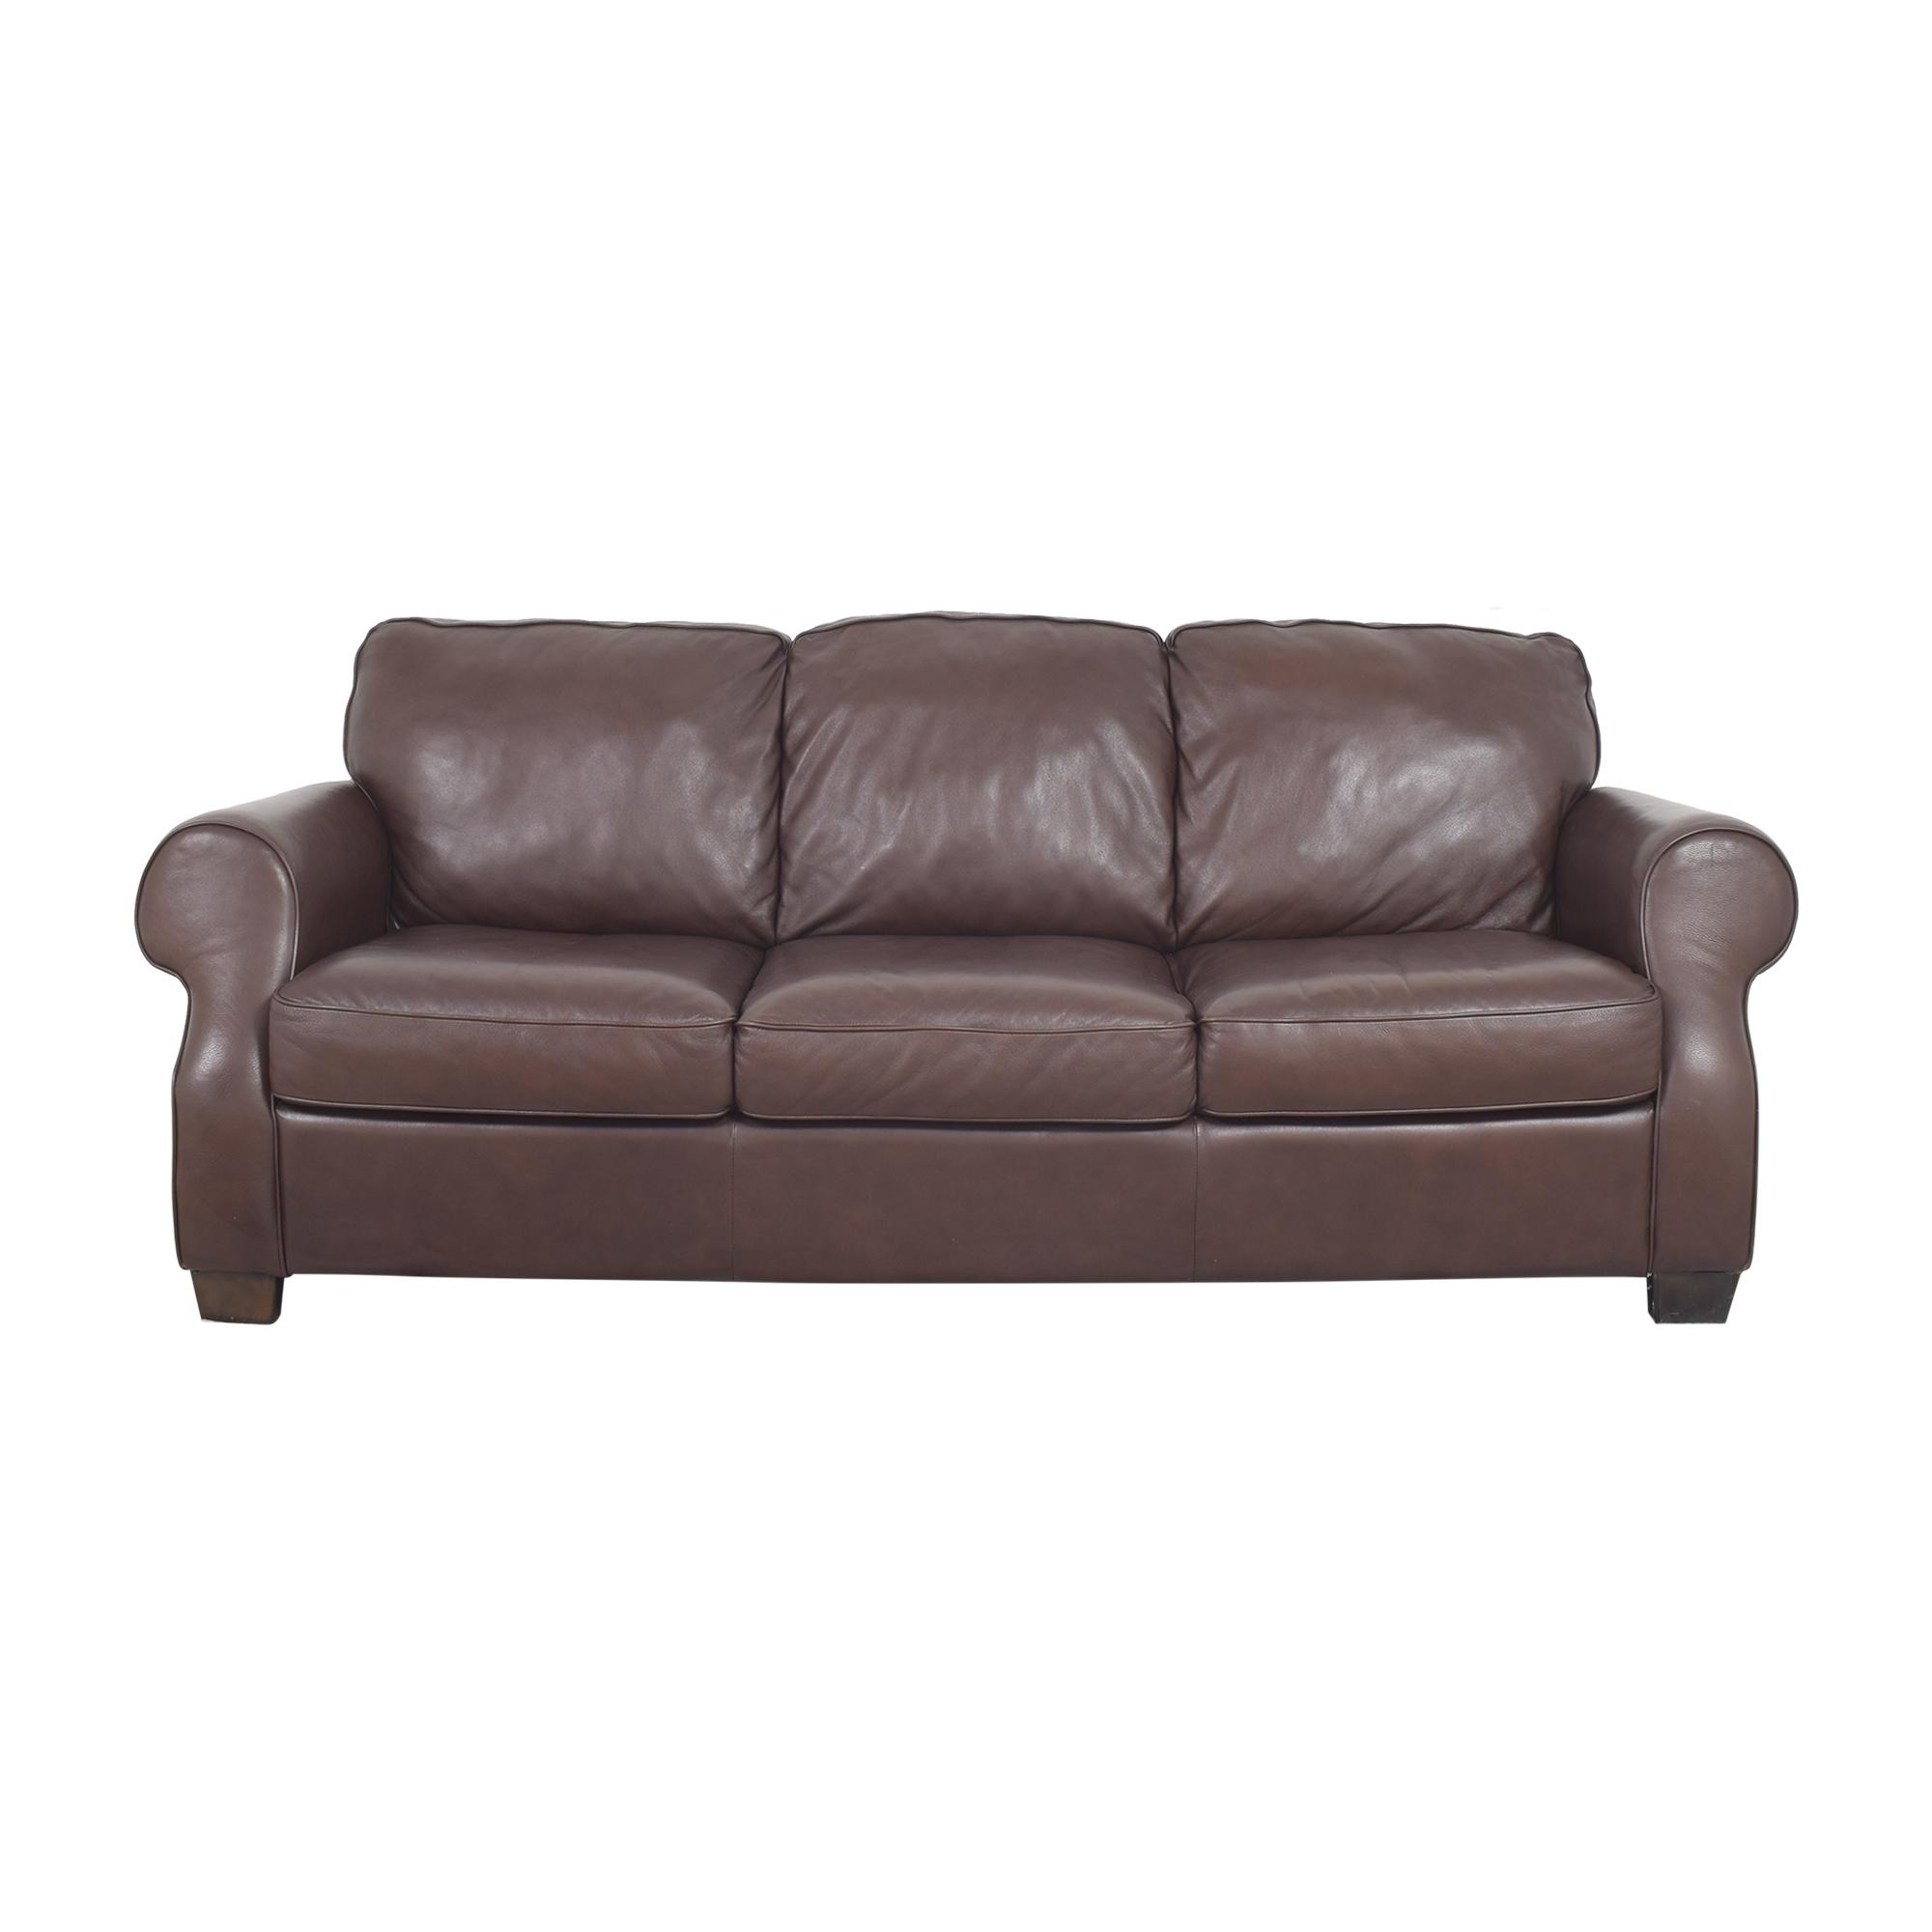 Natuzzi Natuzzi Editions Three Cushion Roll Arm Sofa second hand